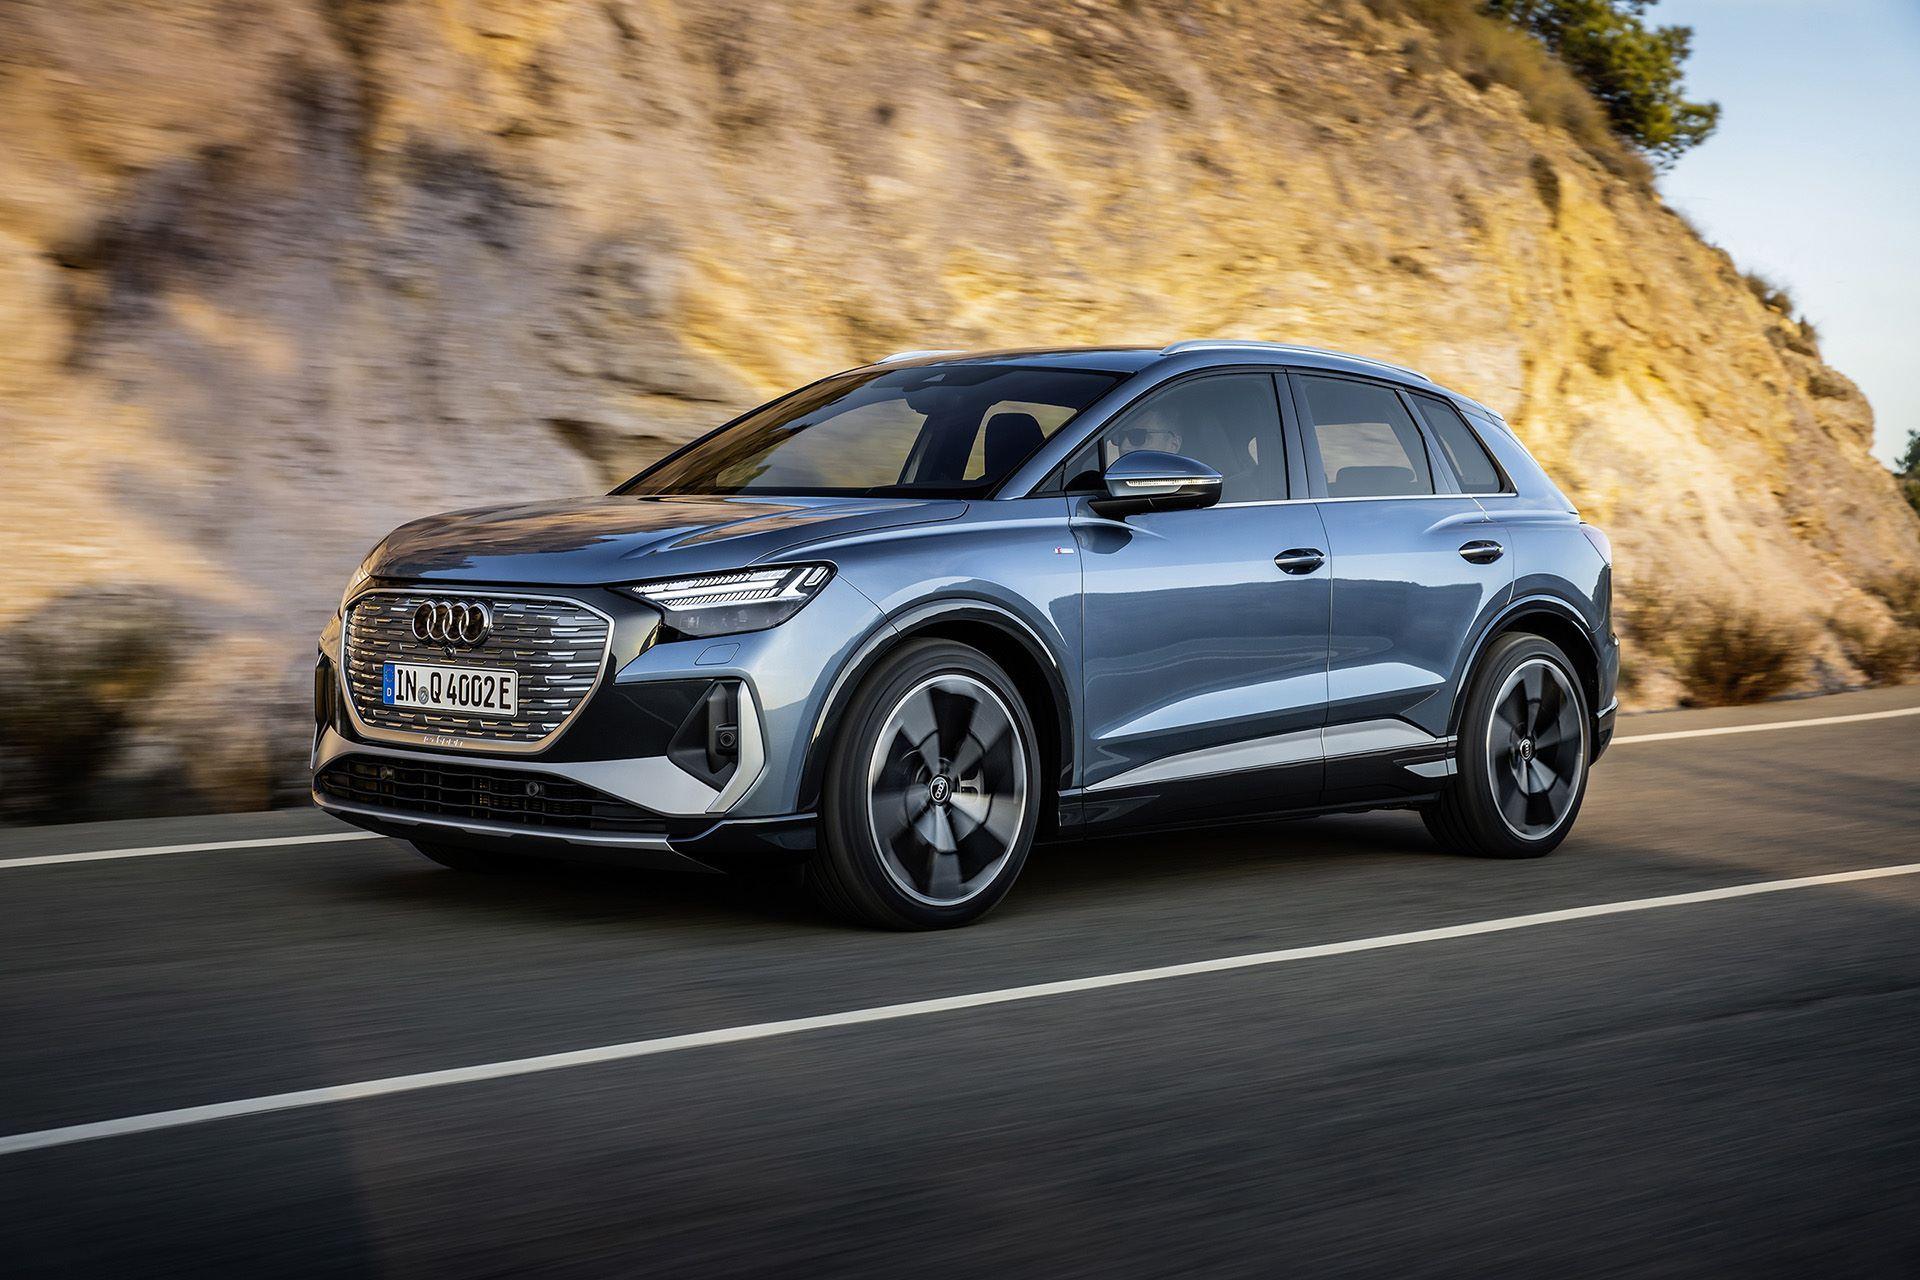 Audi-Q4-e-tron-and-Q4-e-tron-Sportback-22